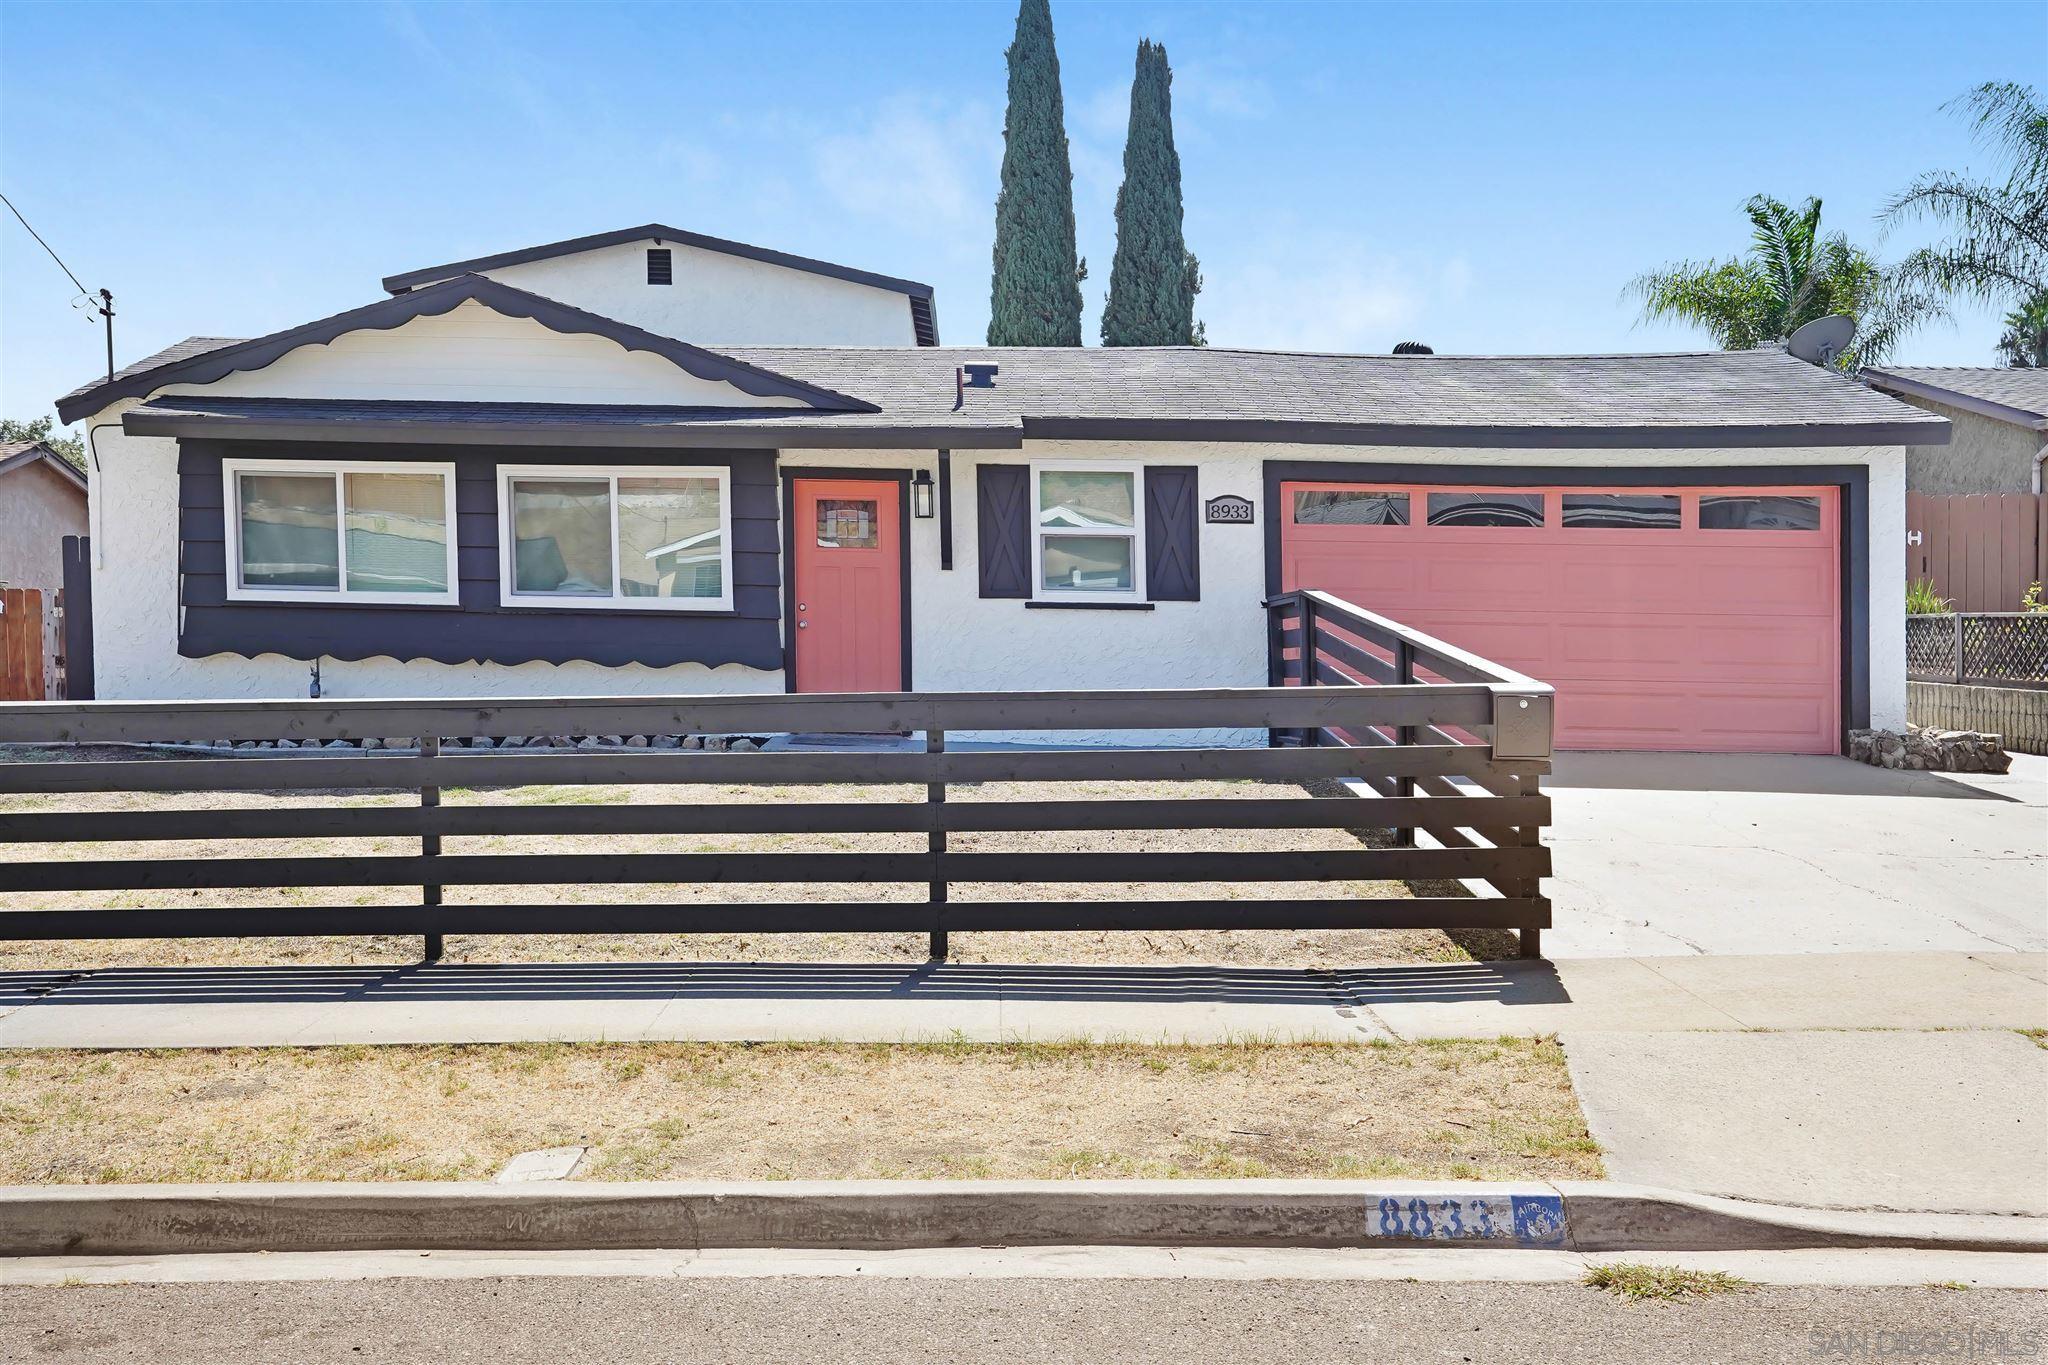 8833 Hillslope Ave, Spring Valley, CA 91977